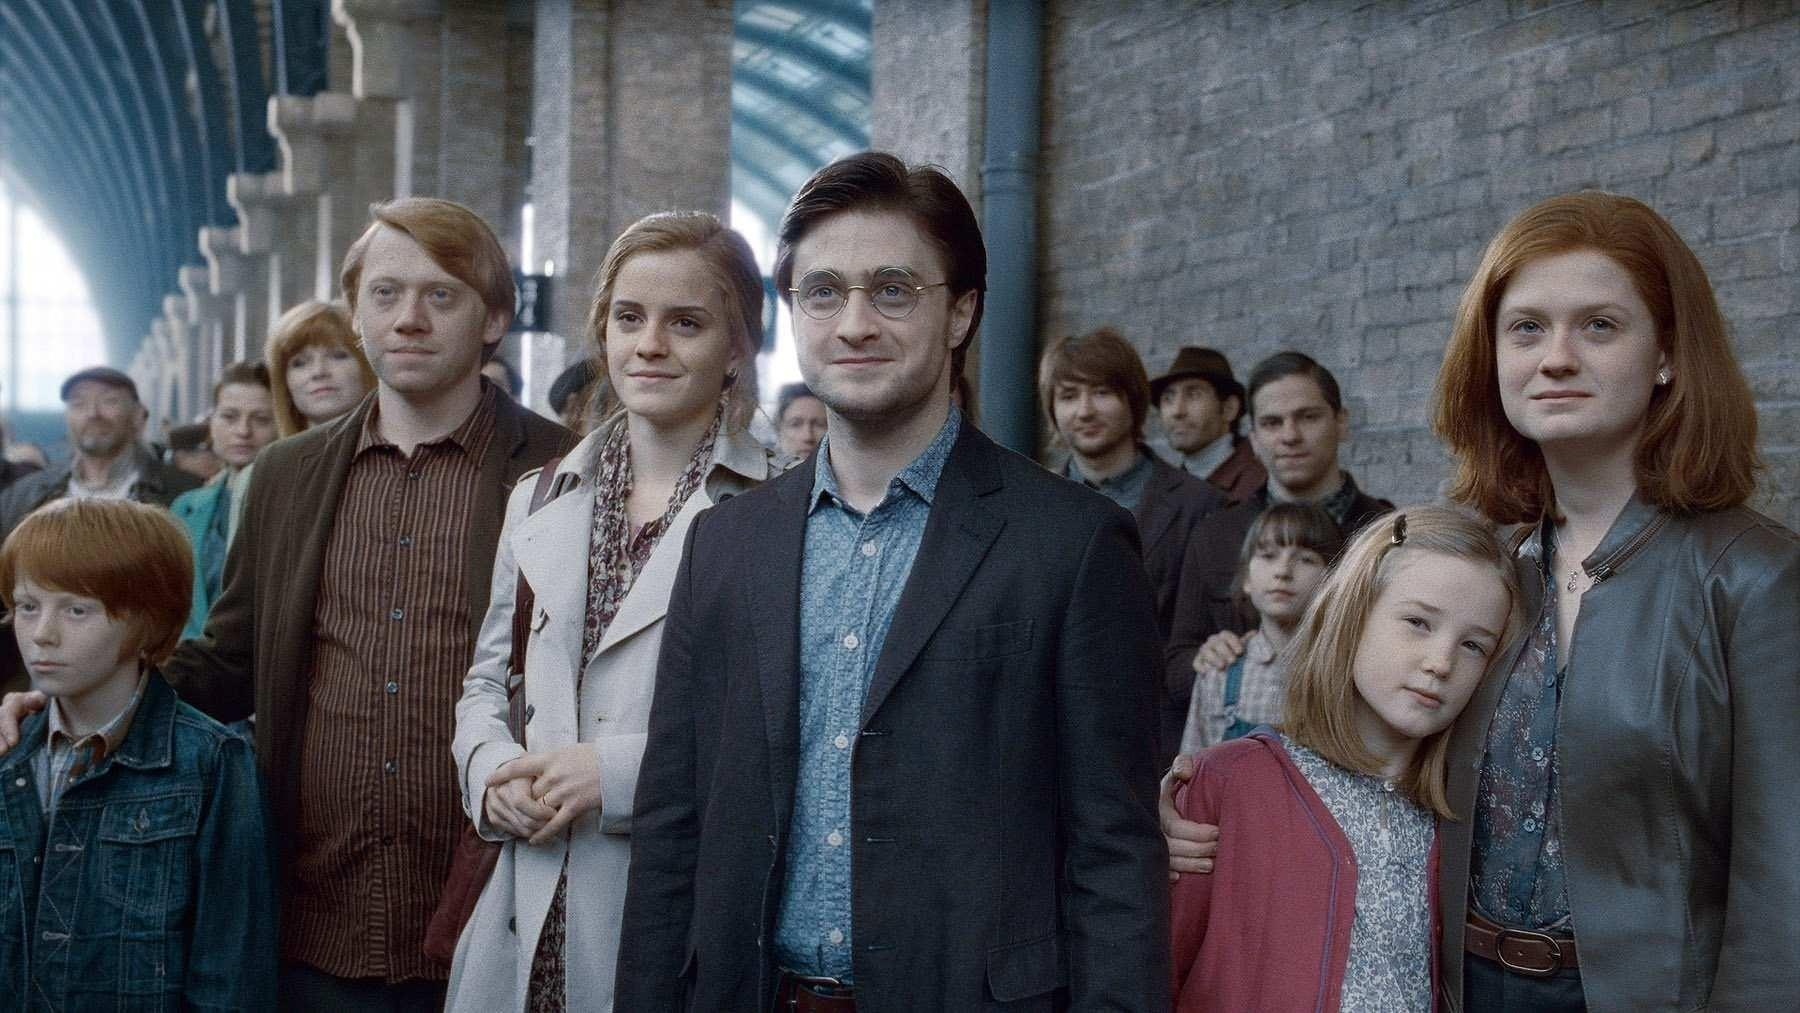 Rupert Grint as Ron Weasley, Emma Watson as Hermione Granger ...